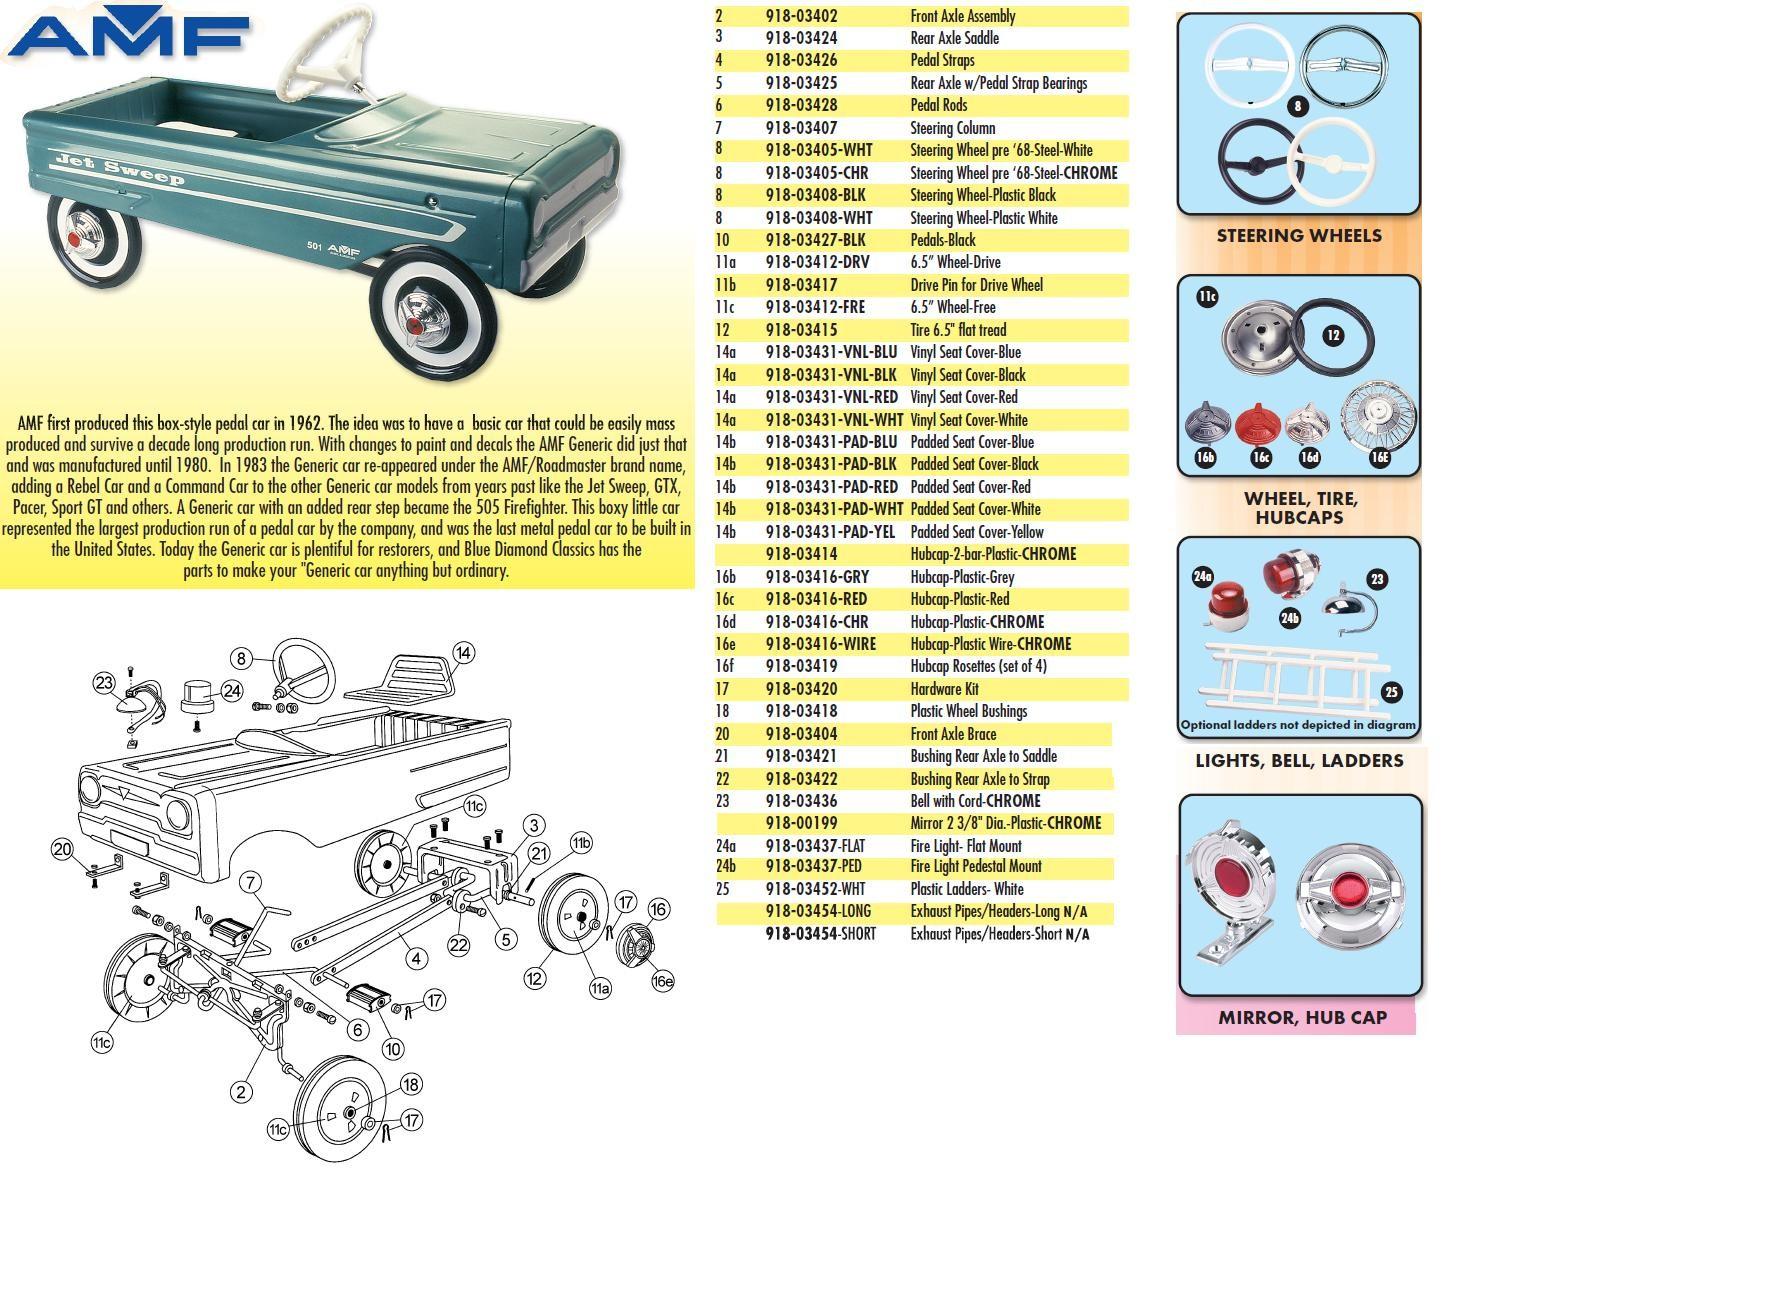 Fire Truck Parts Diagram 6 5 Inch Pedal Car Tire Of Fire Truck Parts Diagram